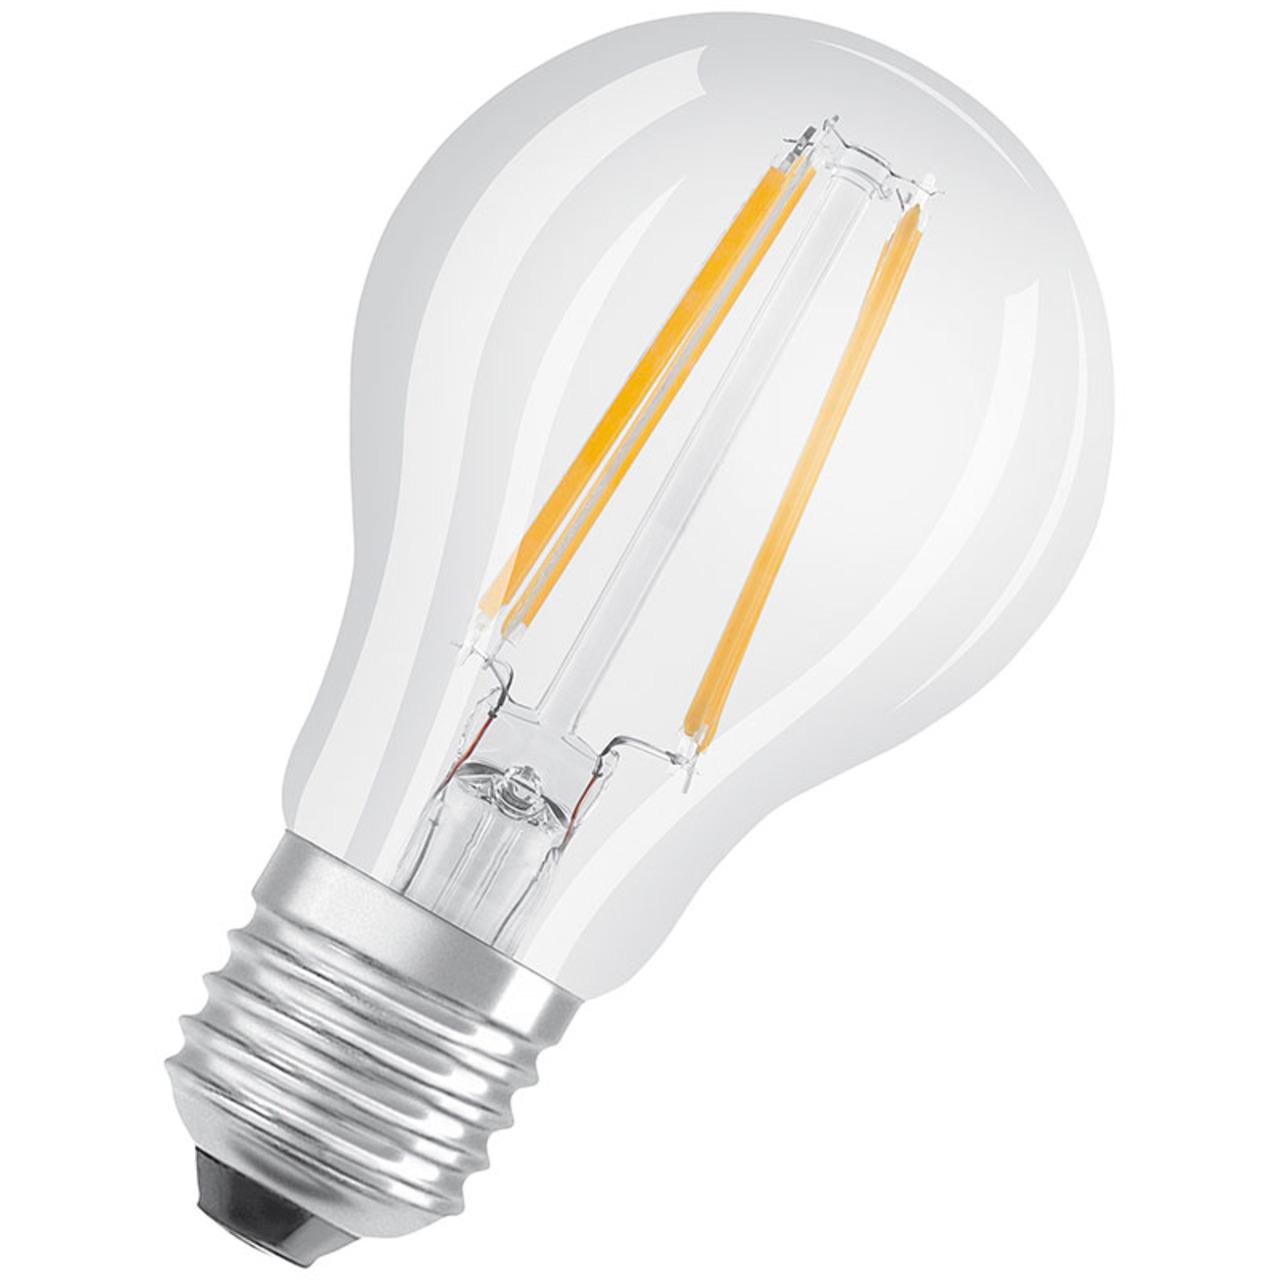 OSRAM LED STAR PLUS 7-W-Filament-LED-Lampe E27 mit GlowDim-Technologie- warmweiss